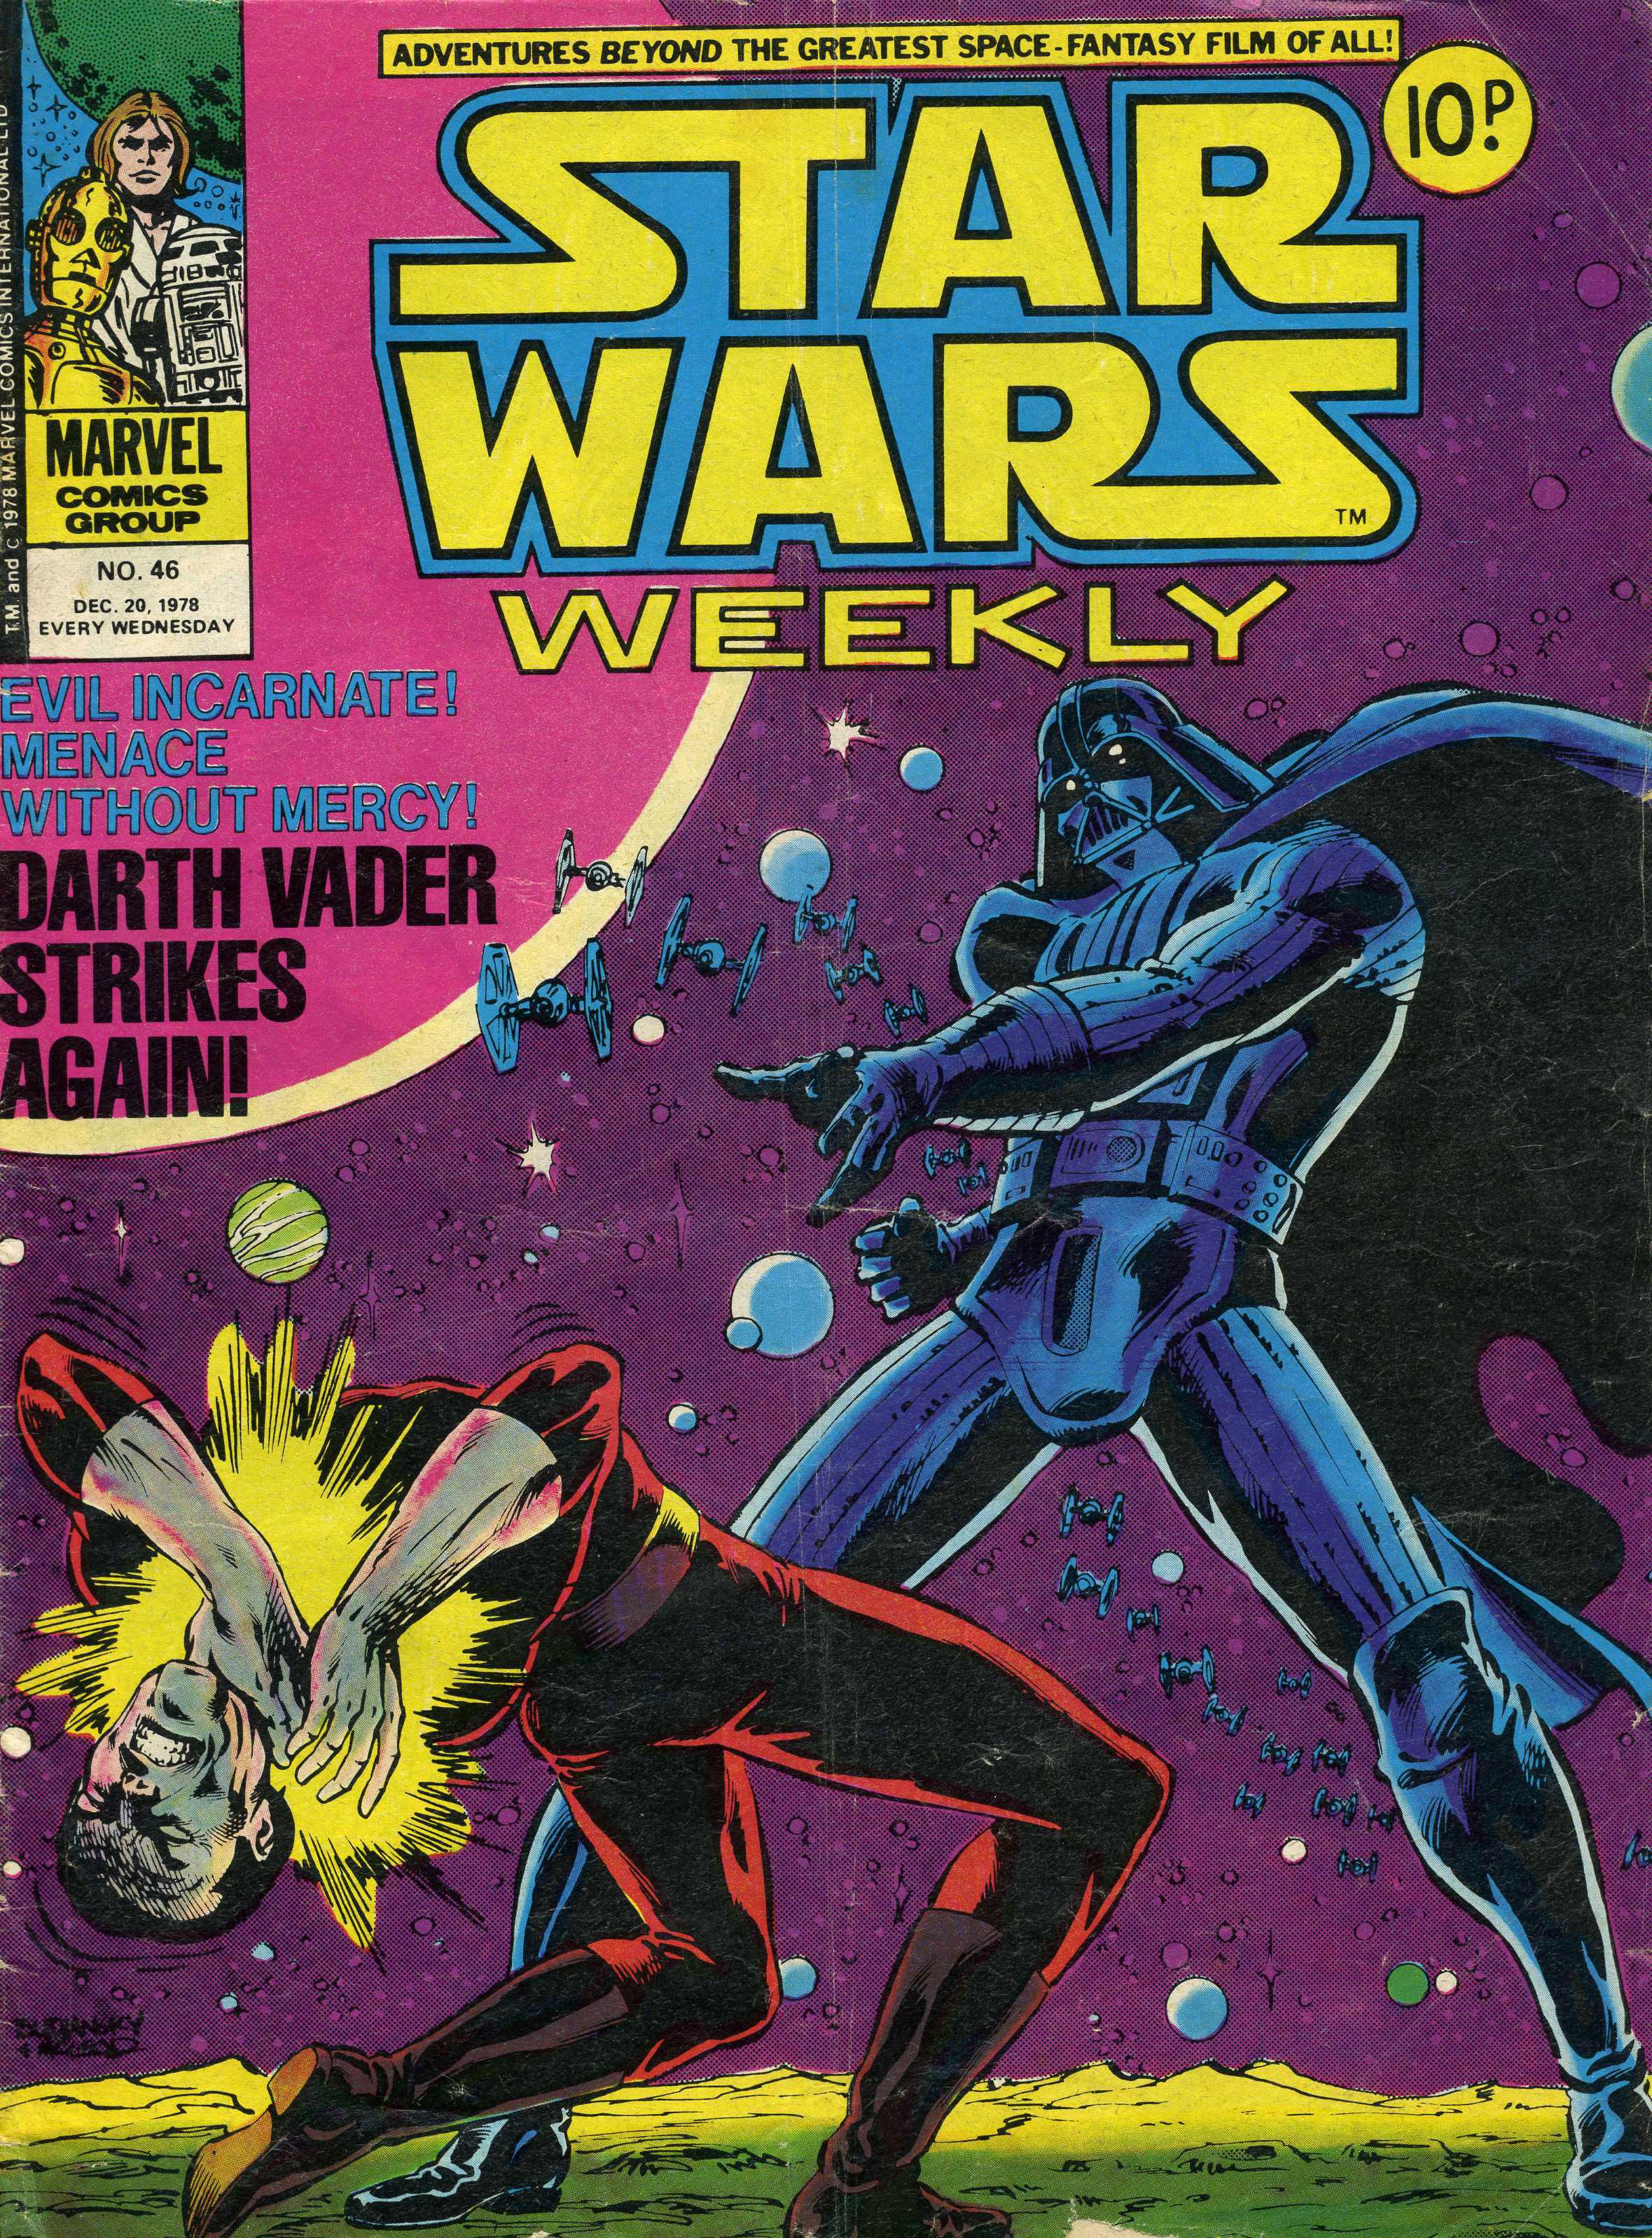 Star Wars Weekly 46